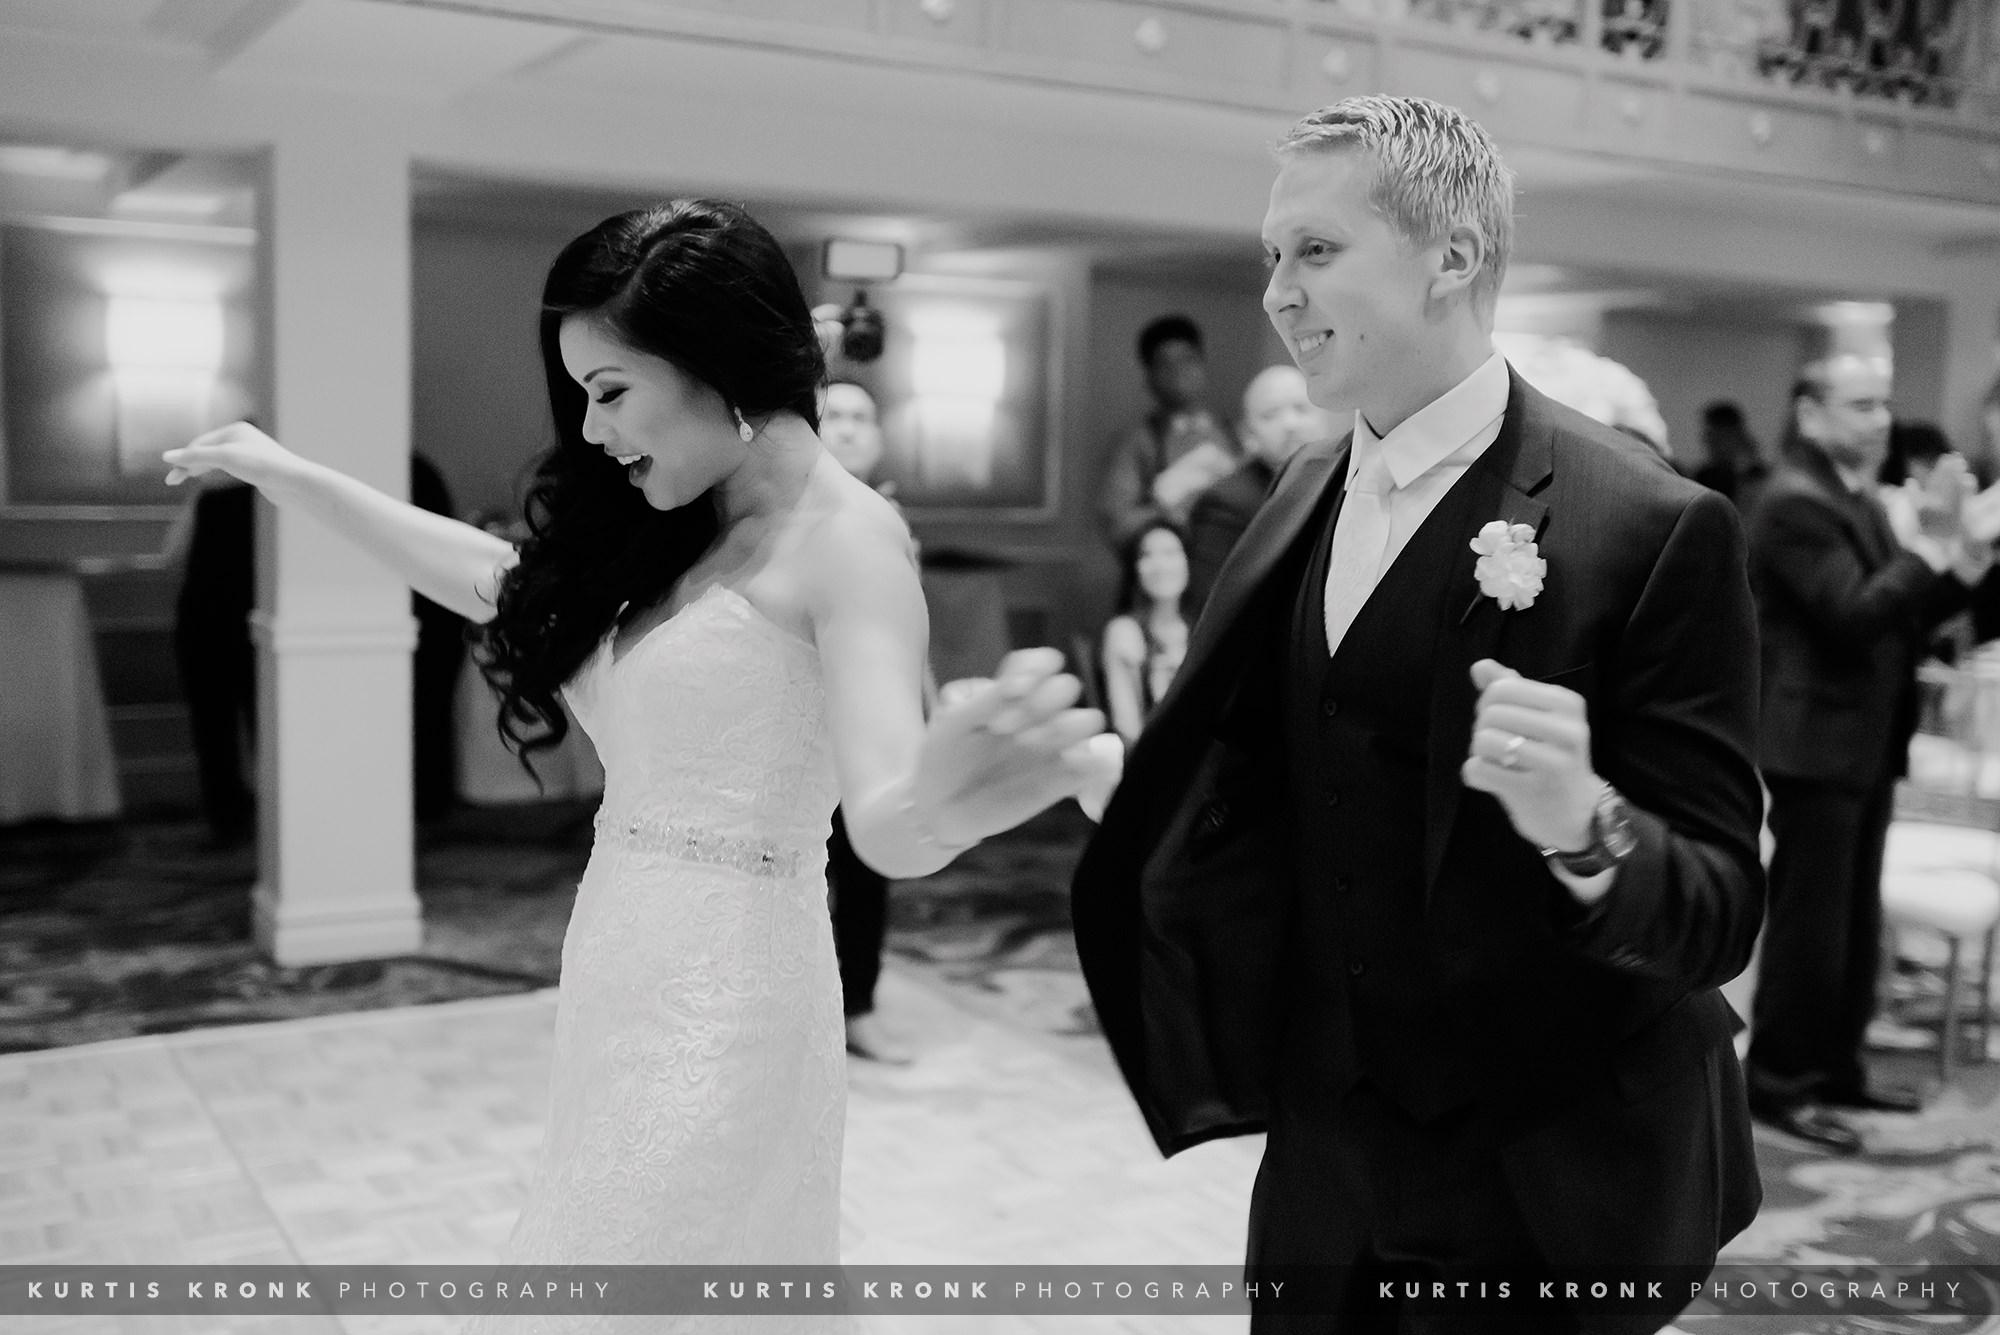 Incarnate Word Chapel + St. Anthony Hotel Wedding in San Antonio